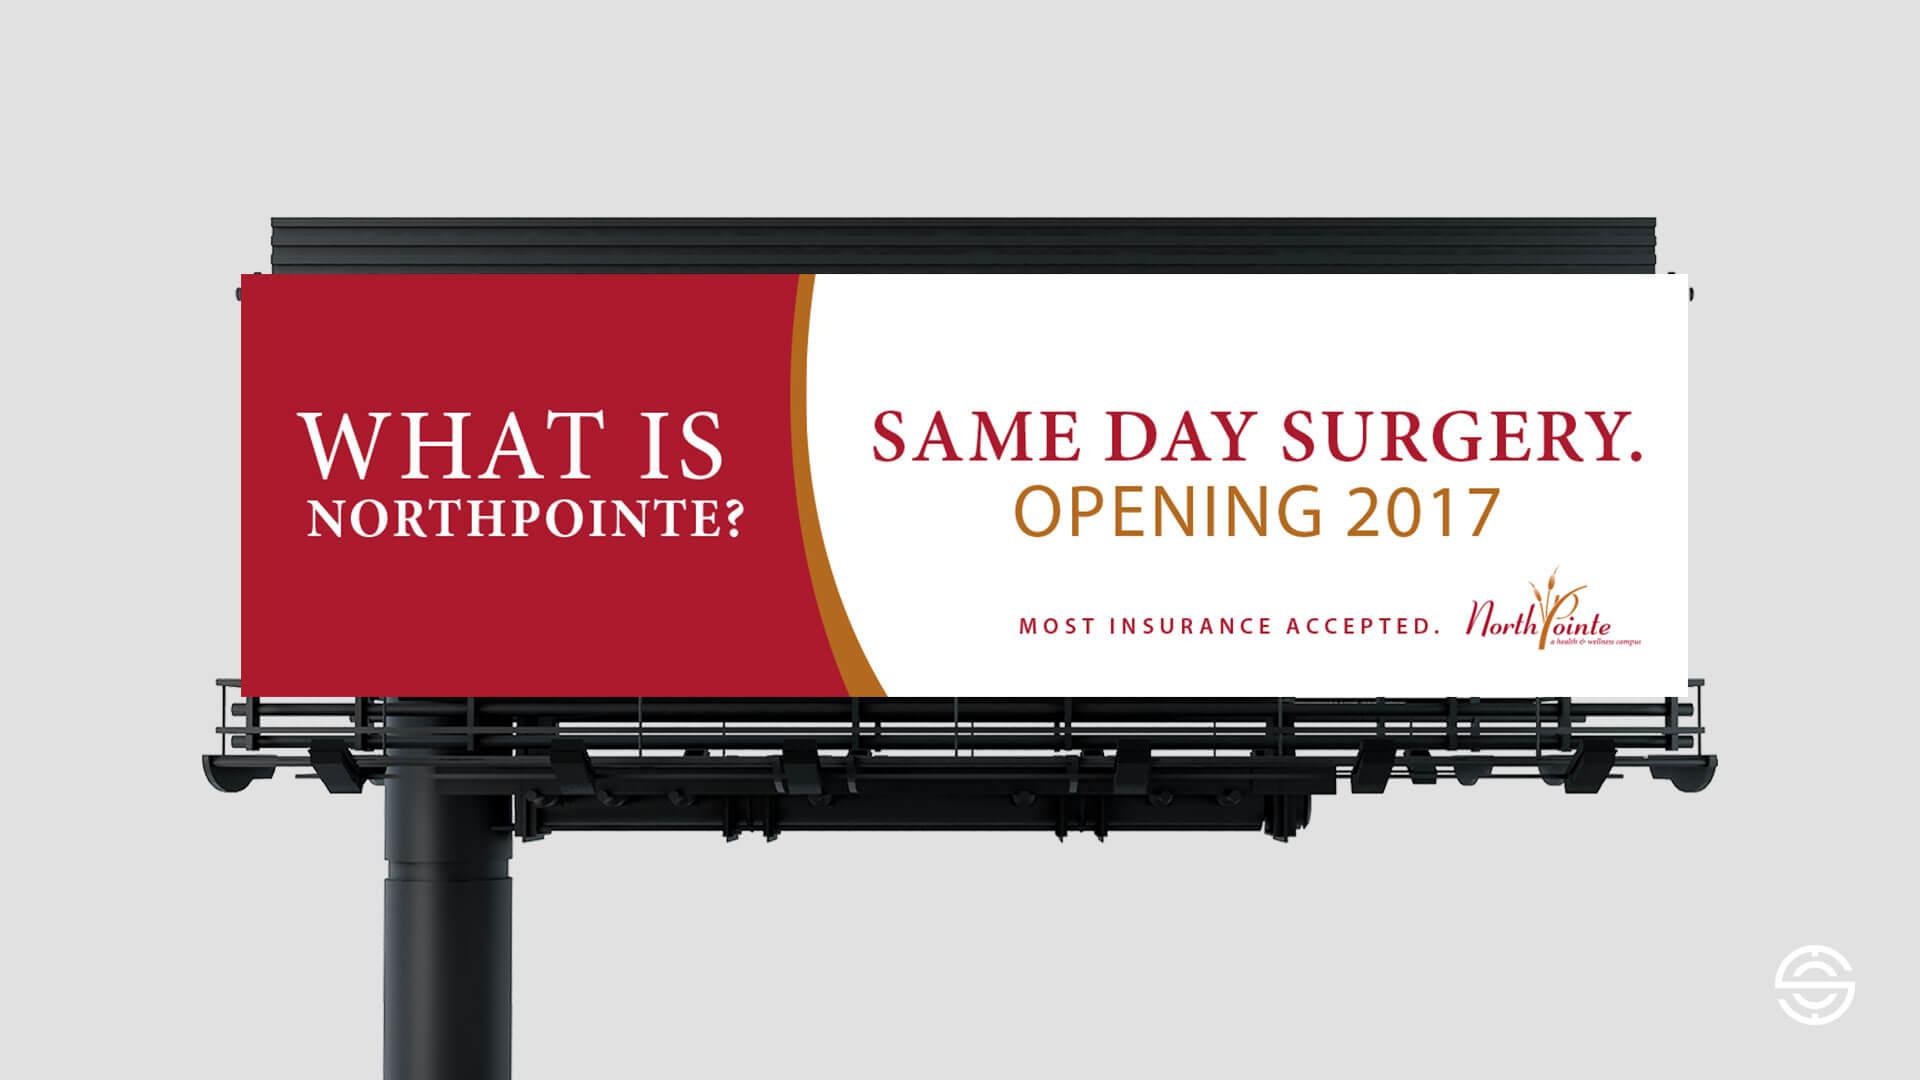 np-whatis-samedaysurgery-billboard.jpg